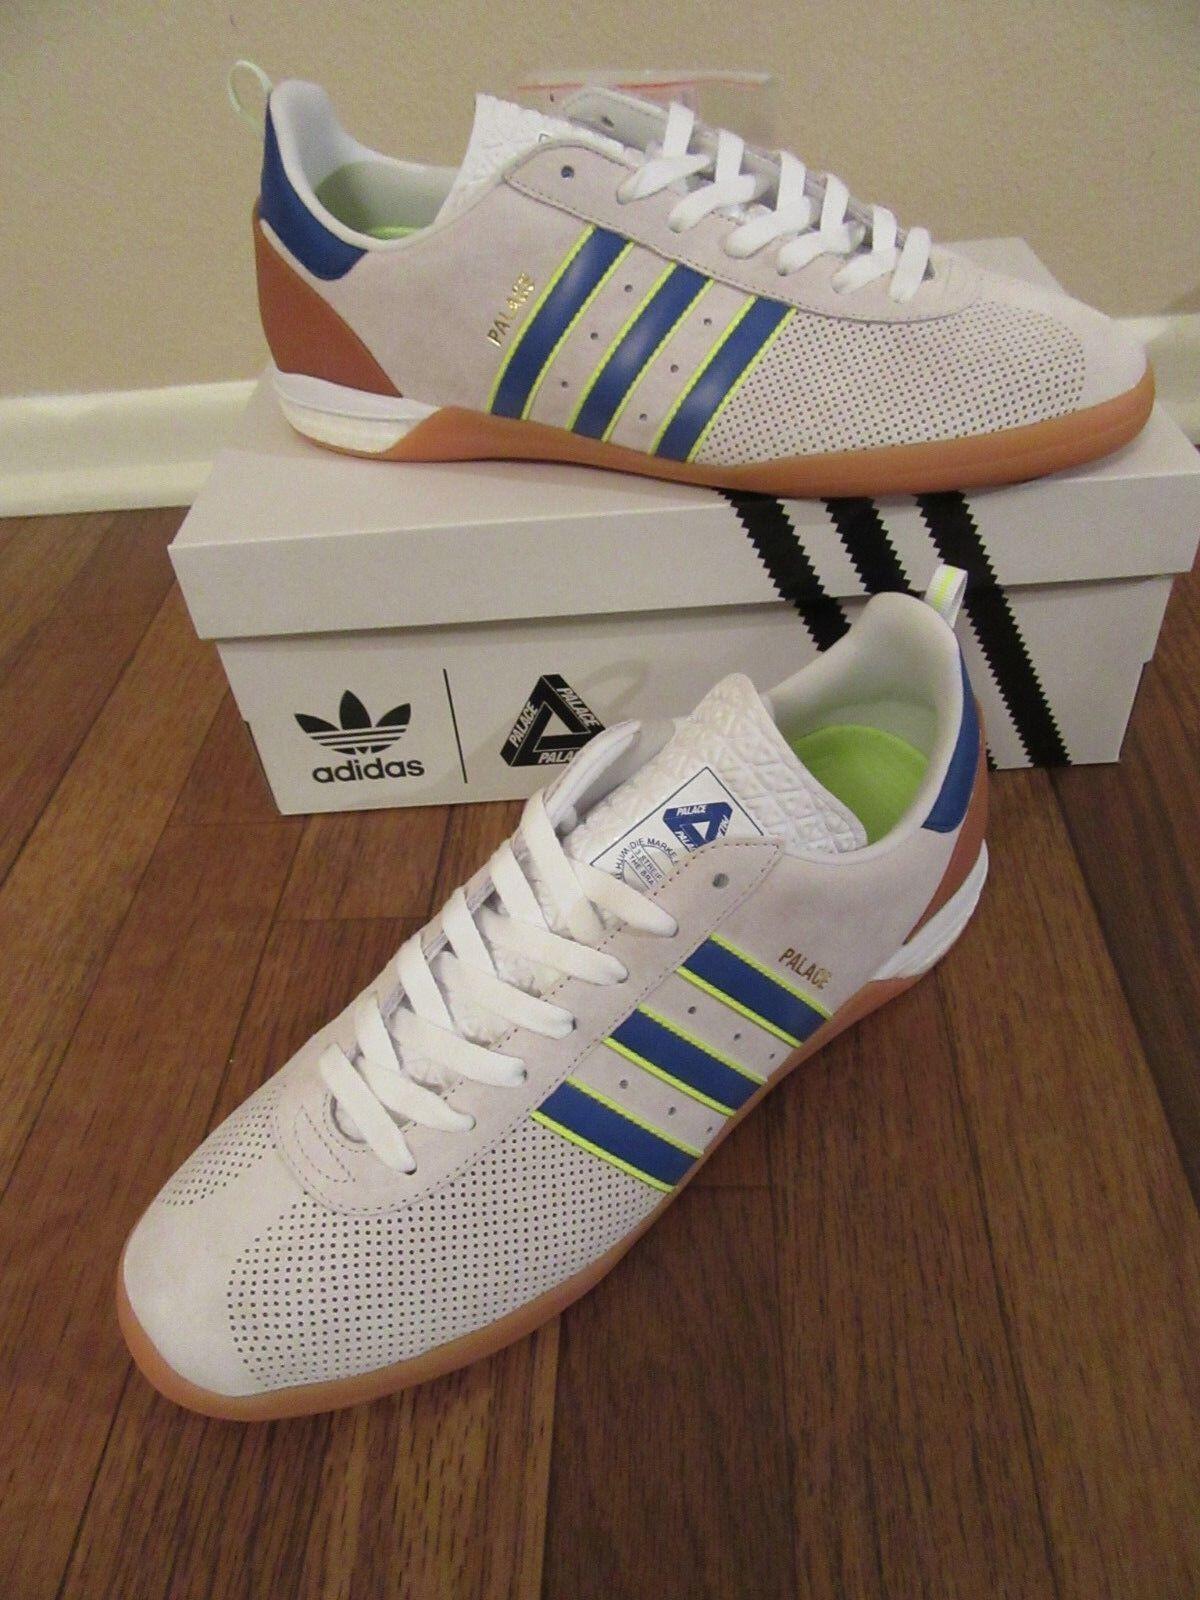 Adidas x Palace Indoor Size 10.5 White Blue Yellow CG3364 Palace London New NIB